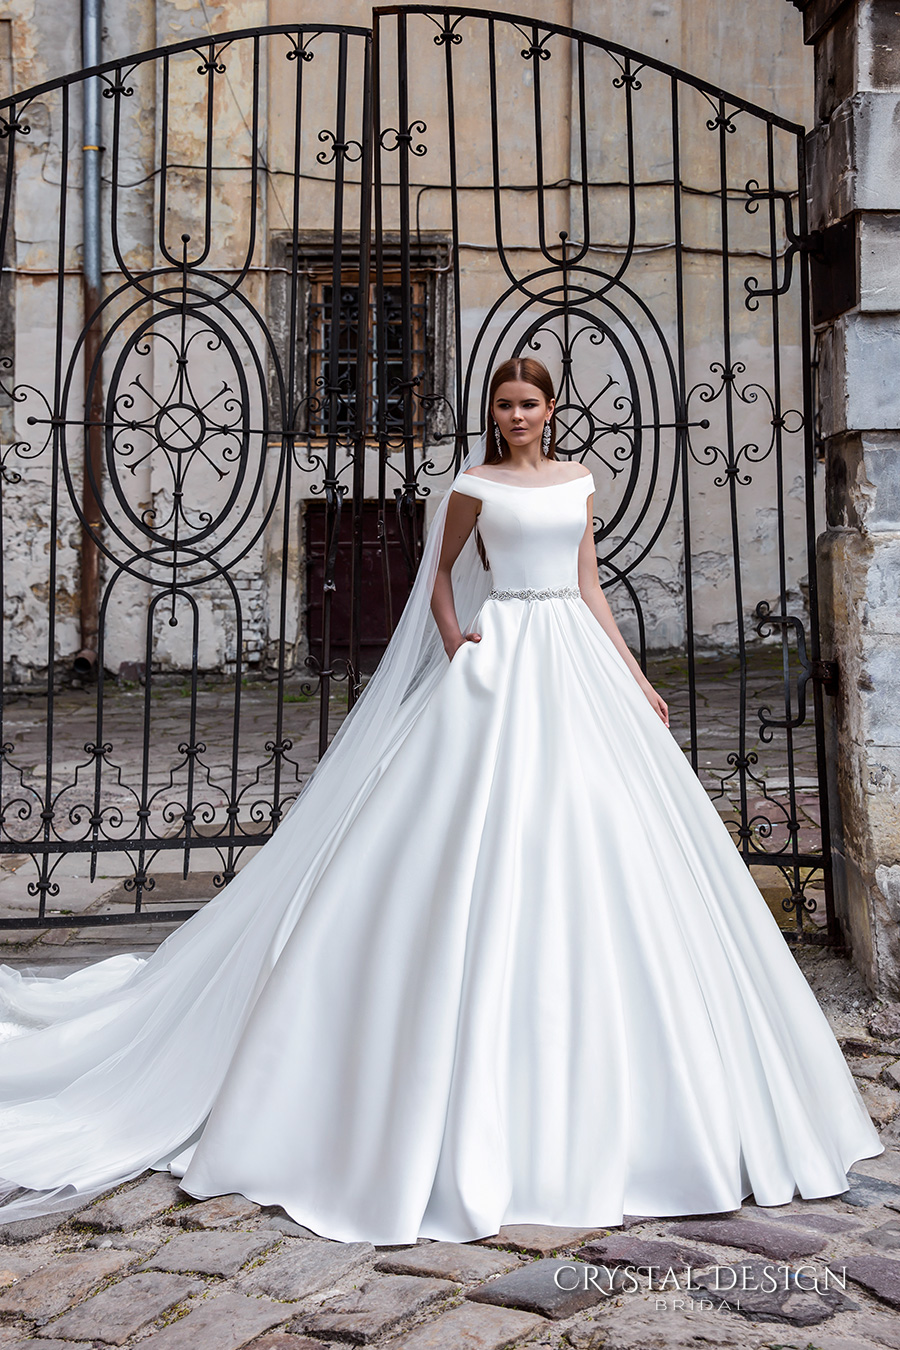 bridal wedding dresses jeweled wedding dress Morilee